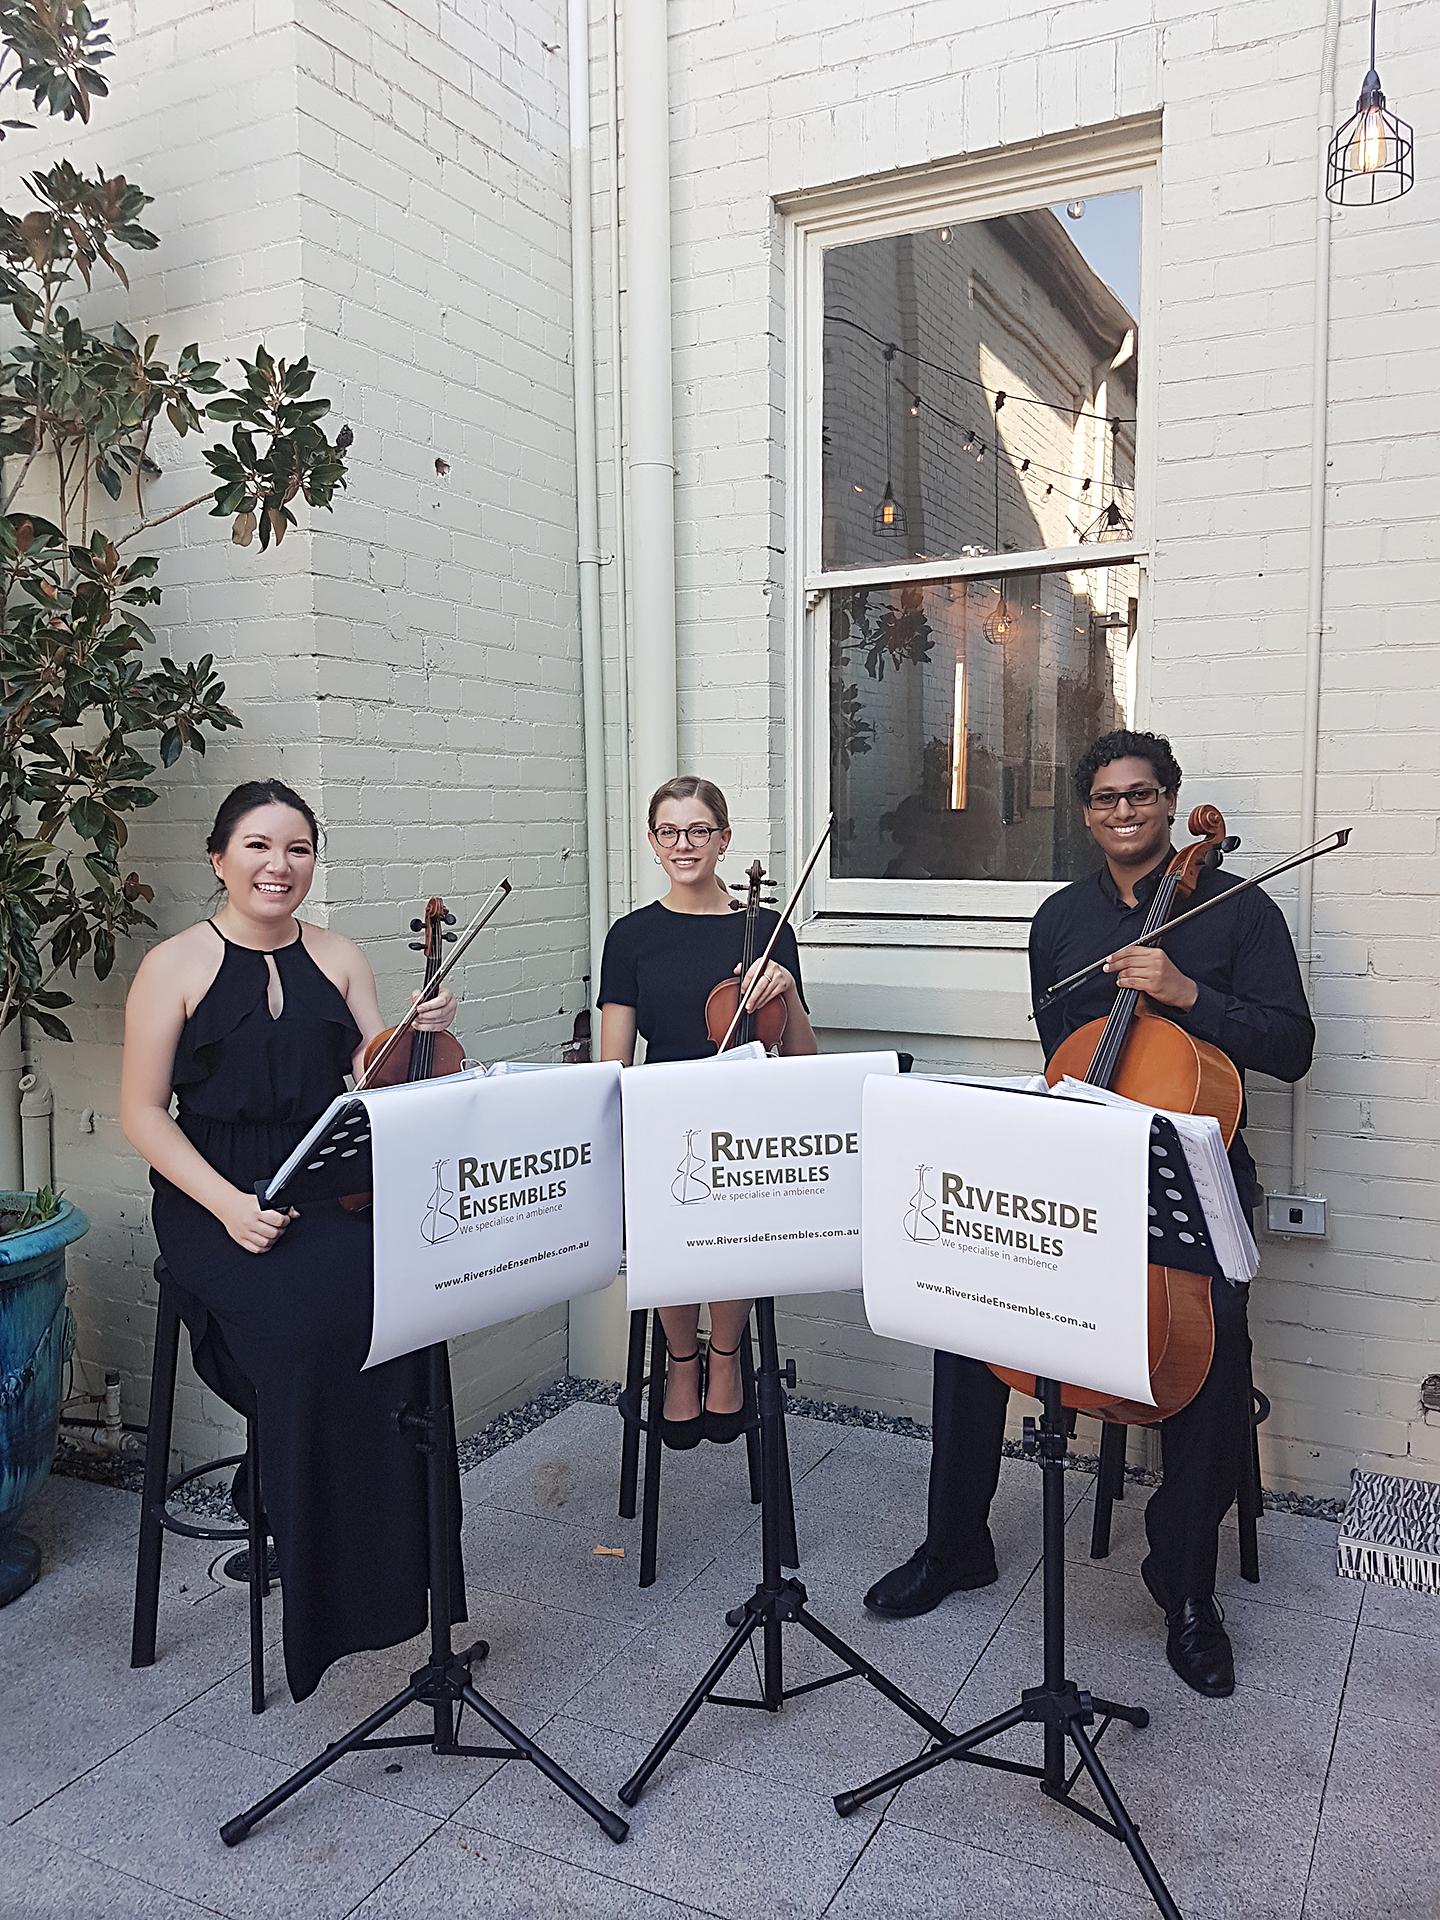 perth-function-string-music-hire-wedding-riverside-trio-cello-violin